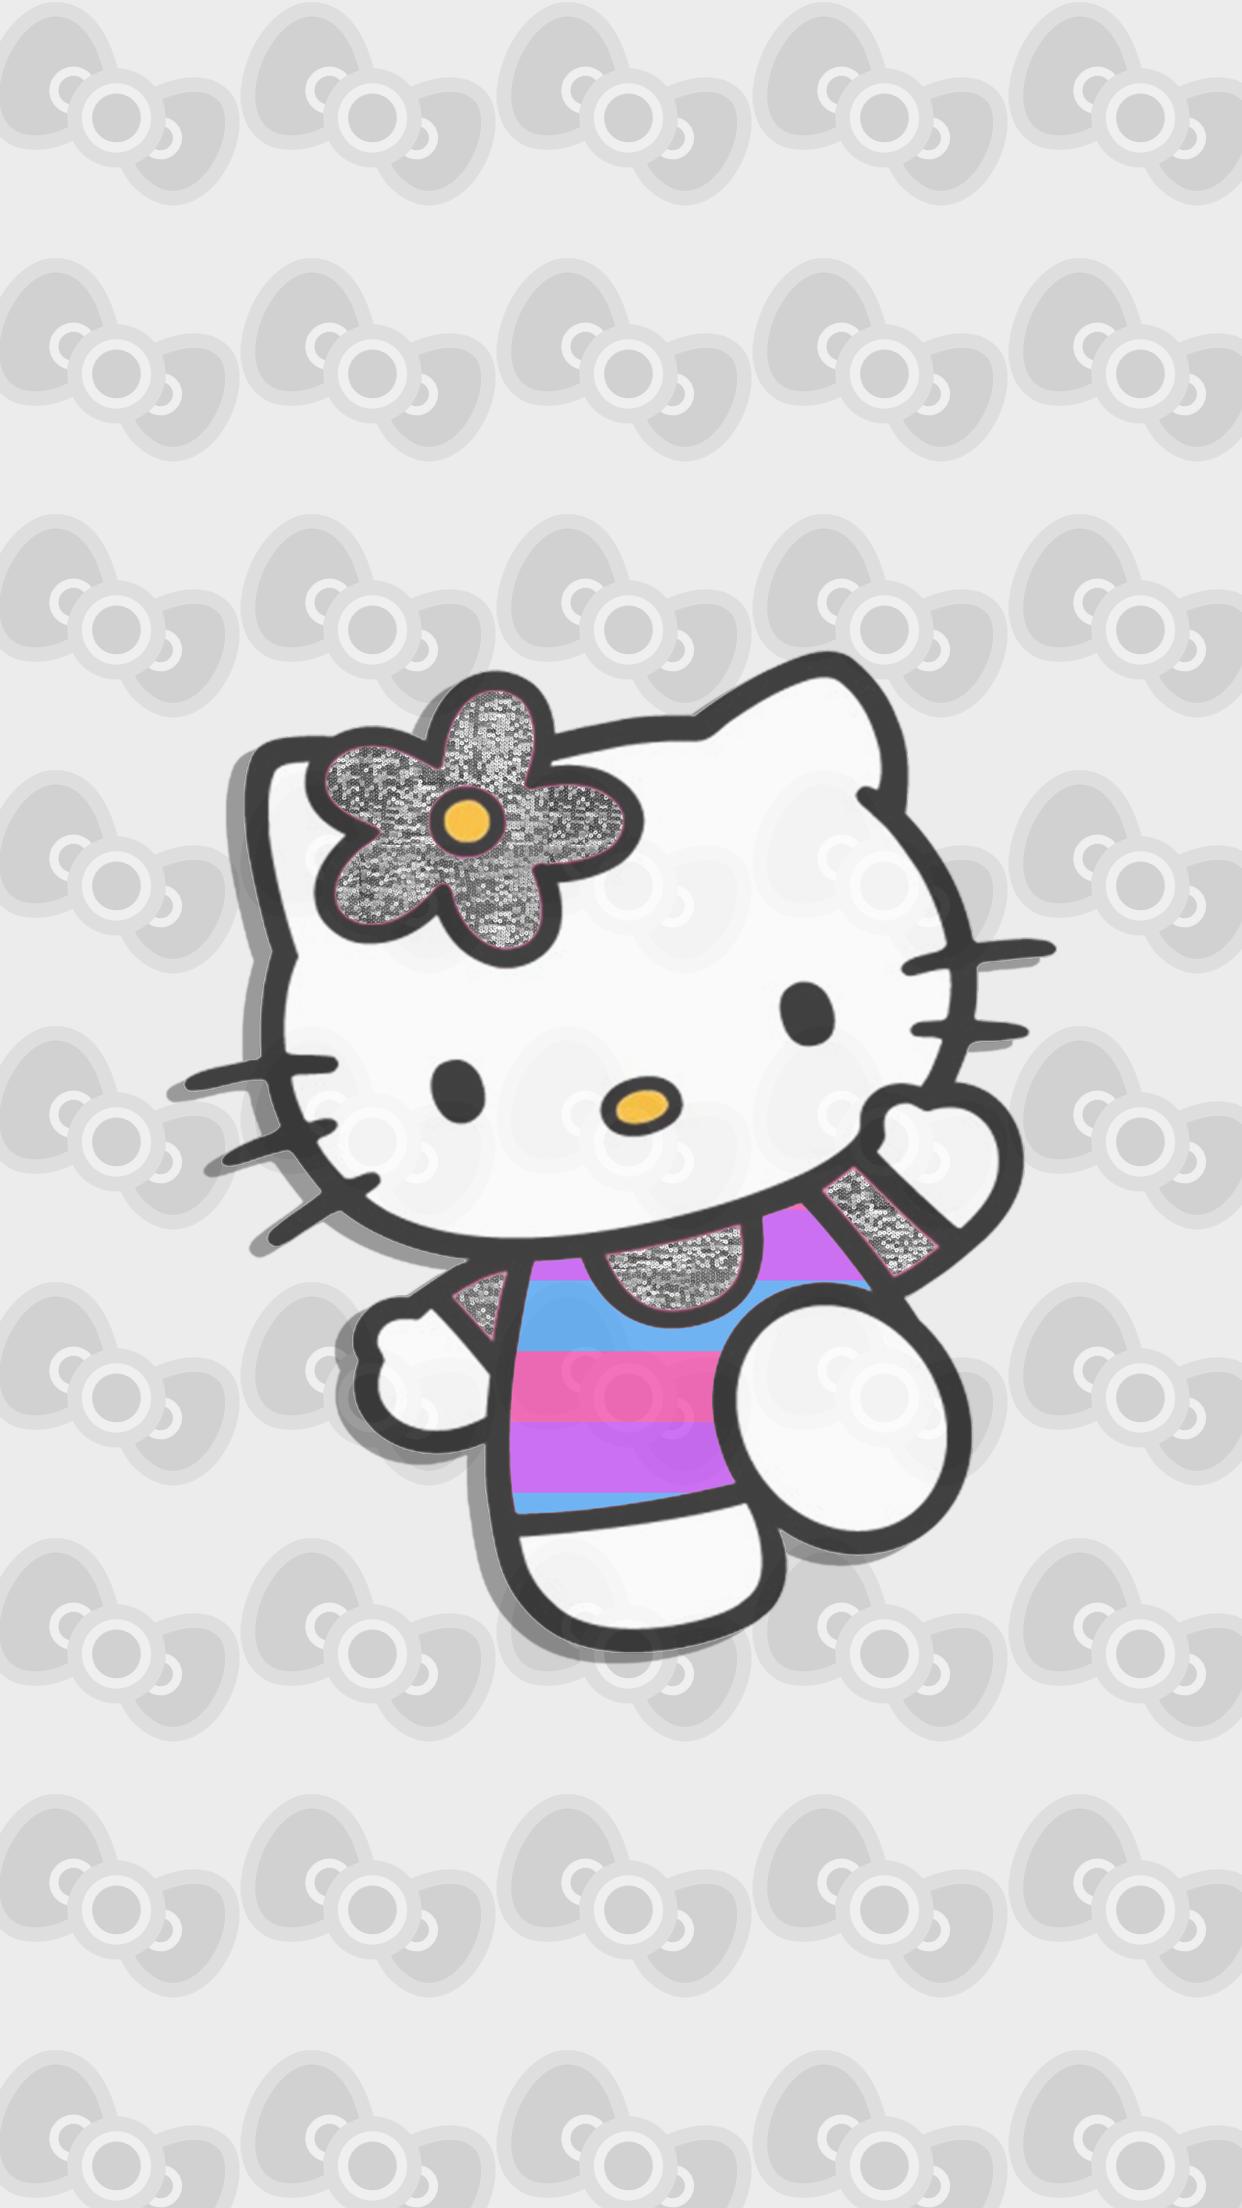 Good Wallpaper Hello Kitty Cute - 527f2e5ef0e24237635eae00cfbe10a3  Trends_659766.png